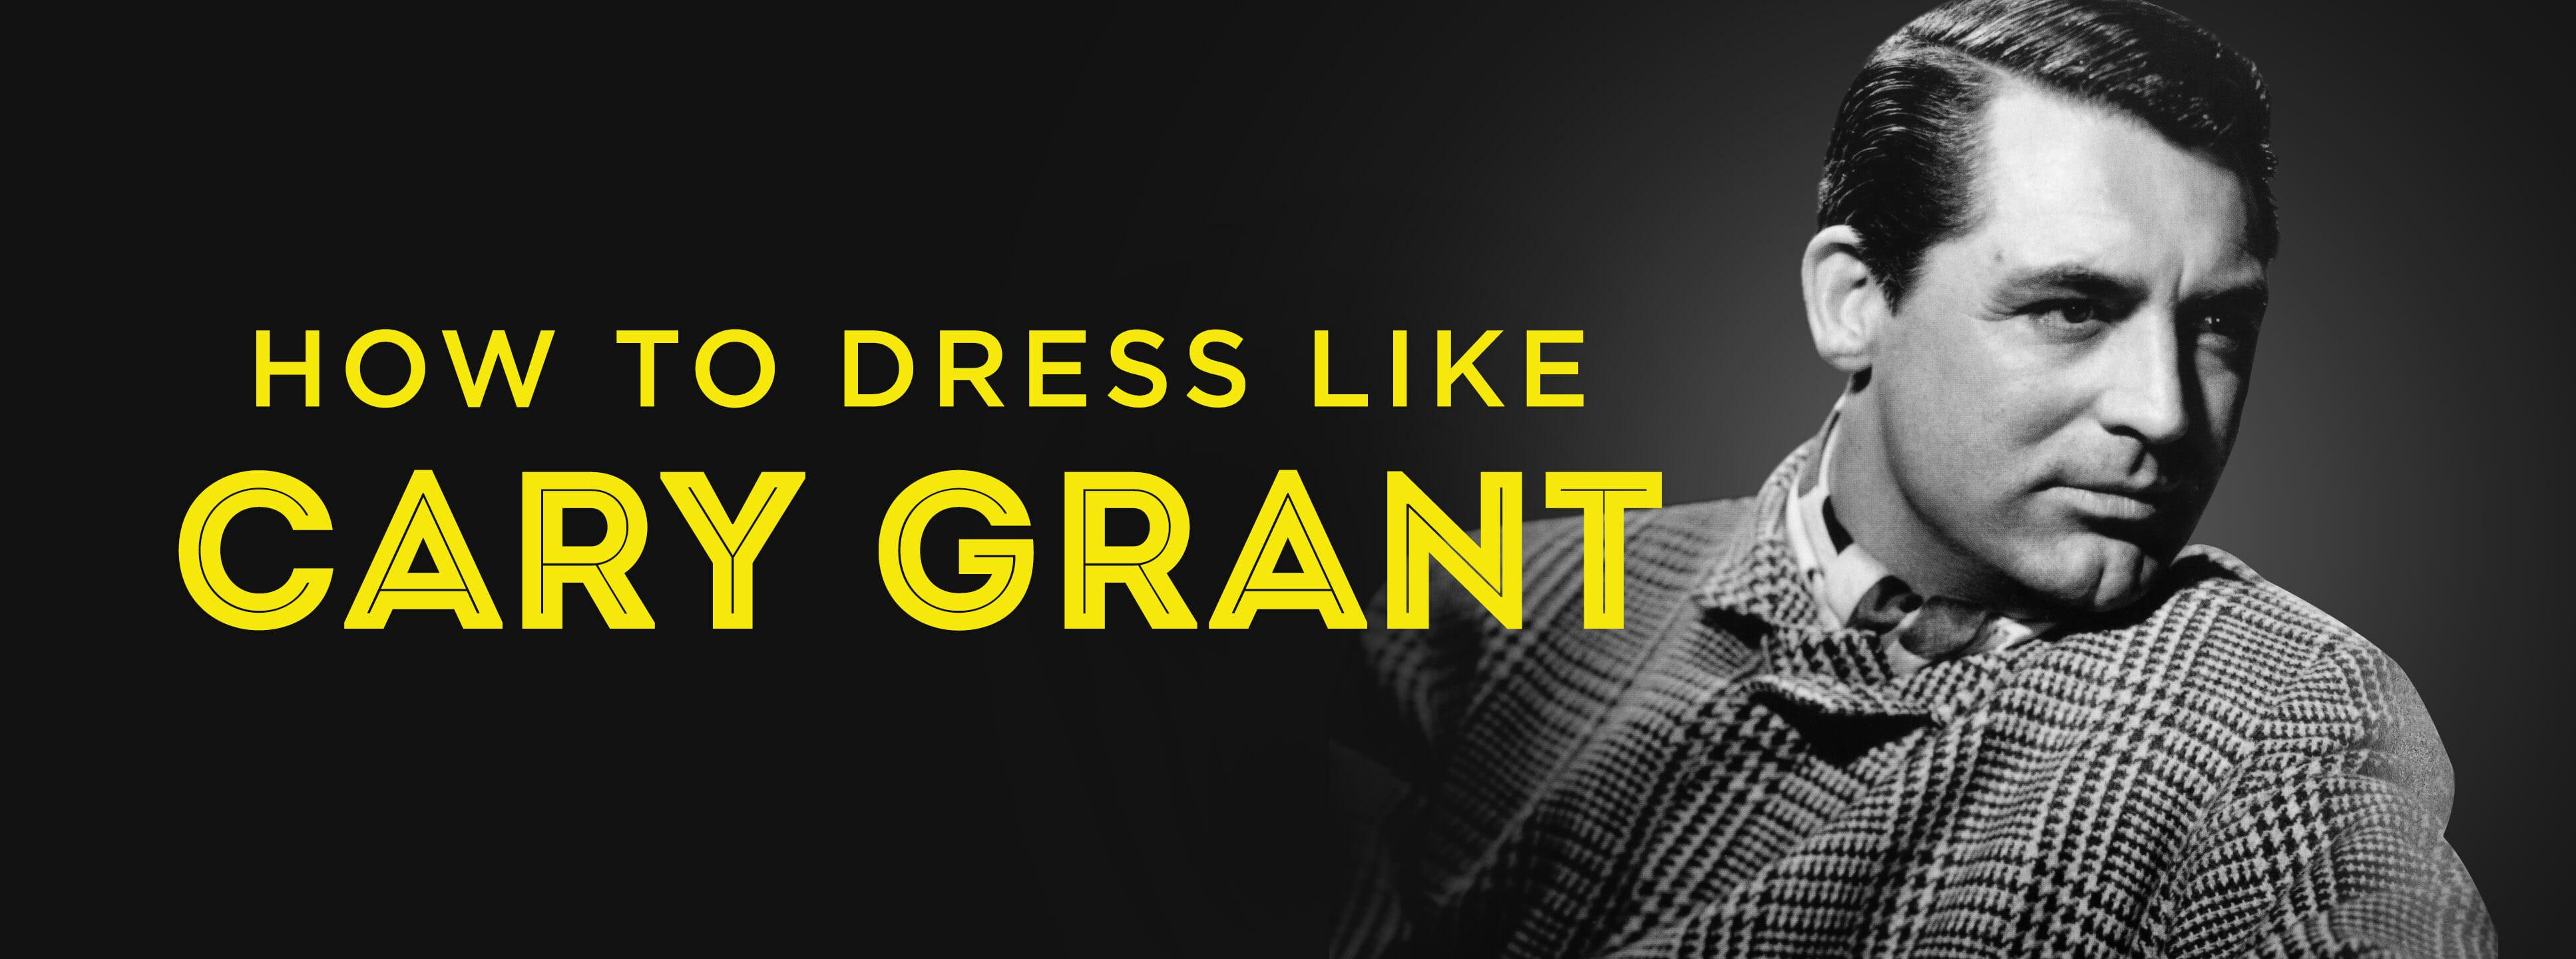 7652166f4e4d Cary Grant Style Secrets & How To Dress Like Him — Gentleman's Gazette